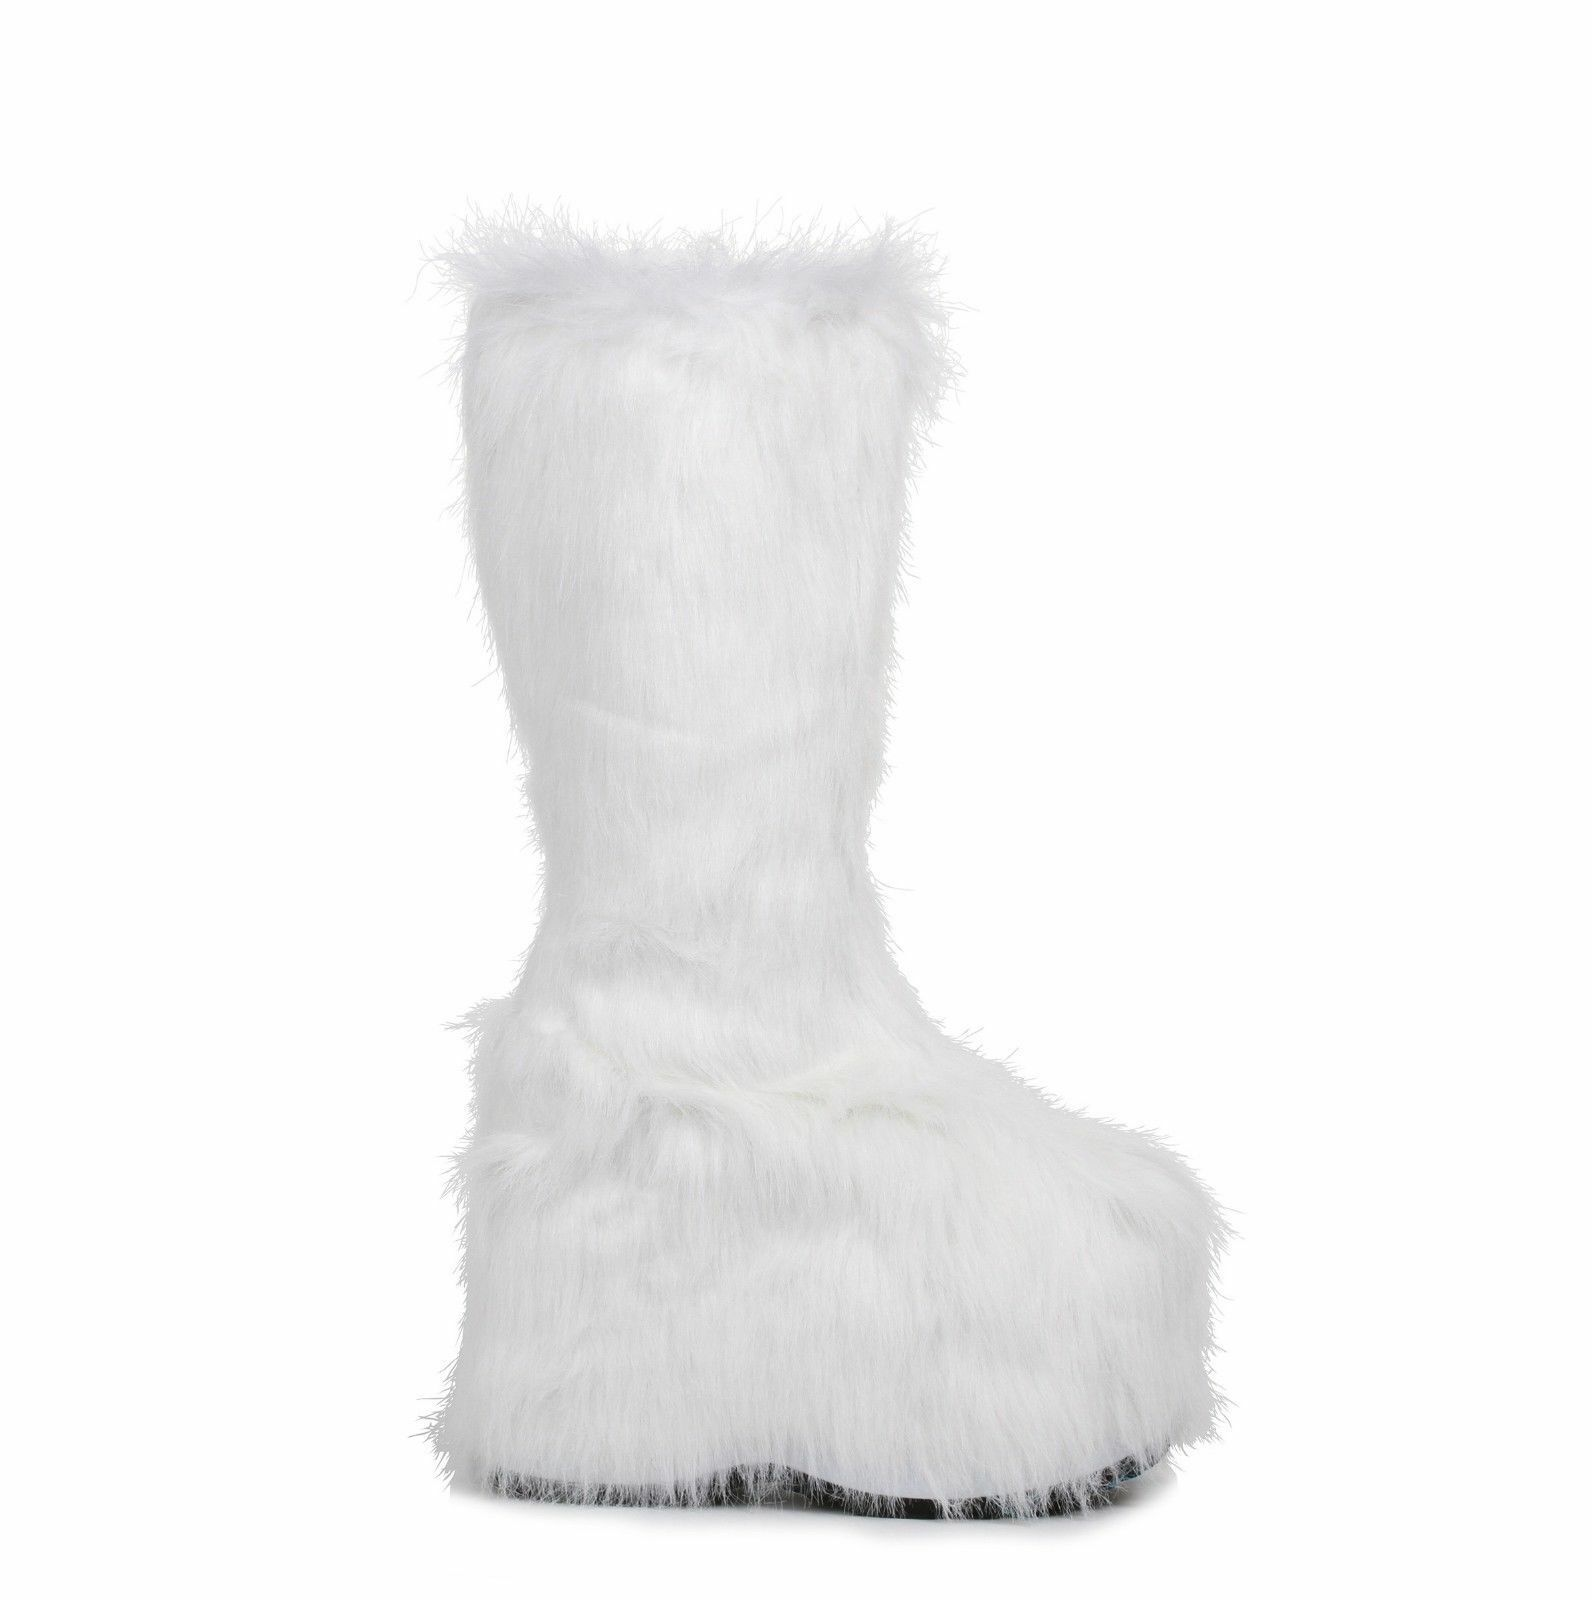 Black Fur Yetti Snow Monster Monster Monster EDC Rave Goth Platform GoGo Boots Womans ALL Sizes 292166